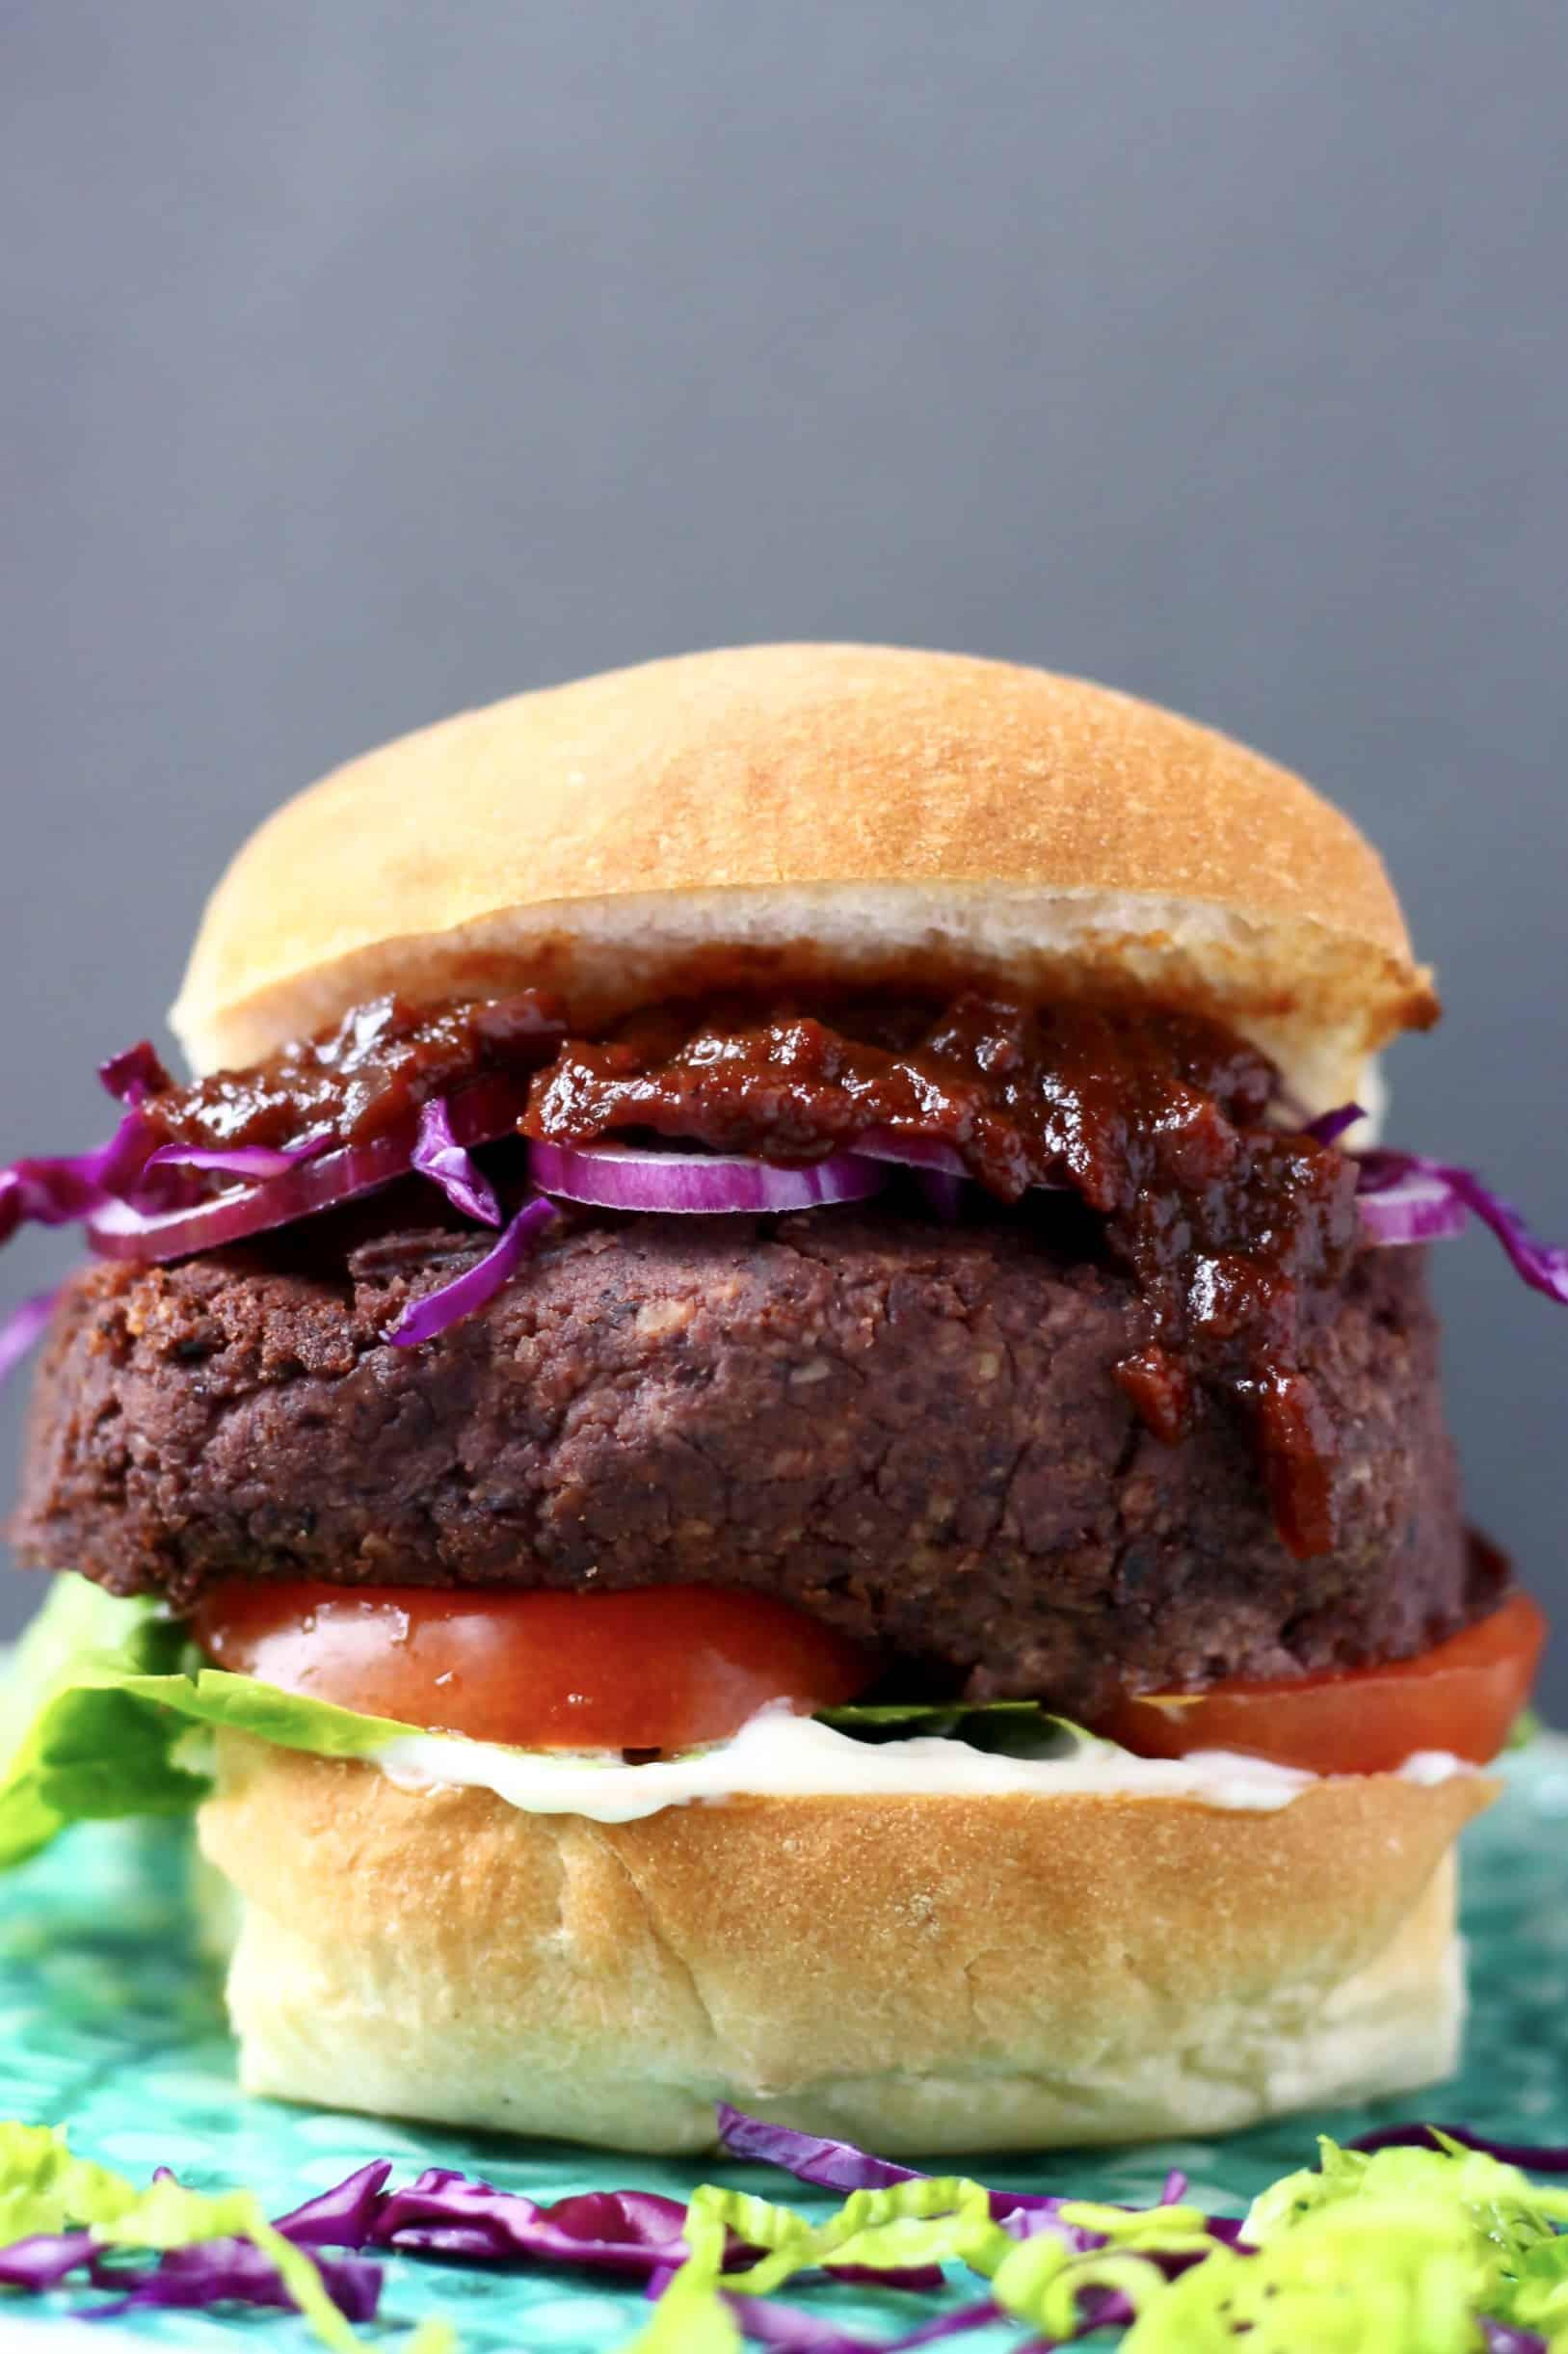 Vegan mushroom black bean burger with salad on a blue plate